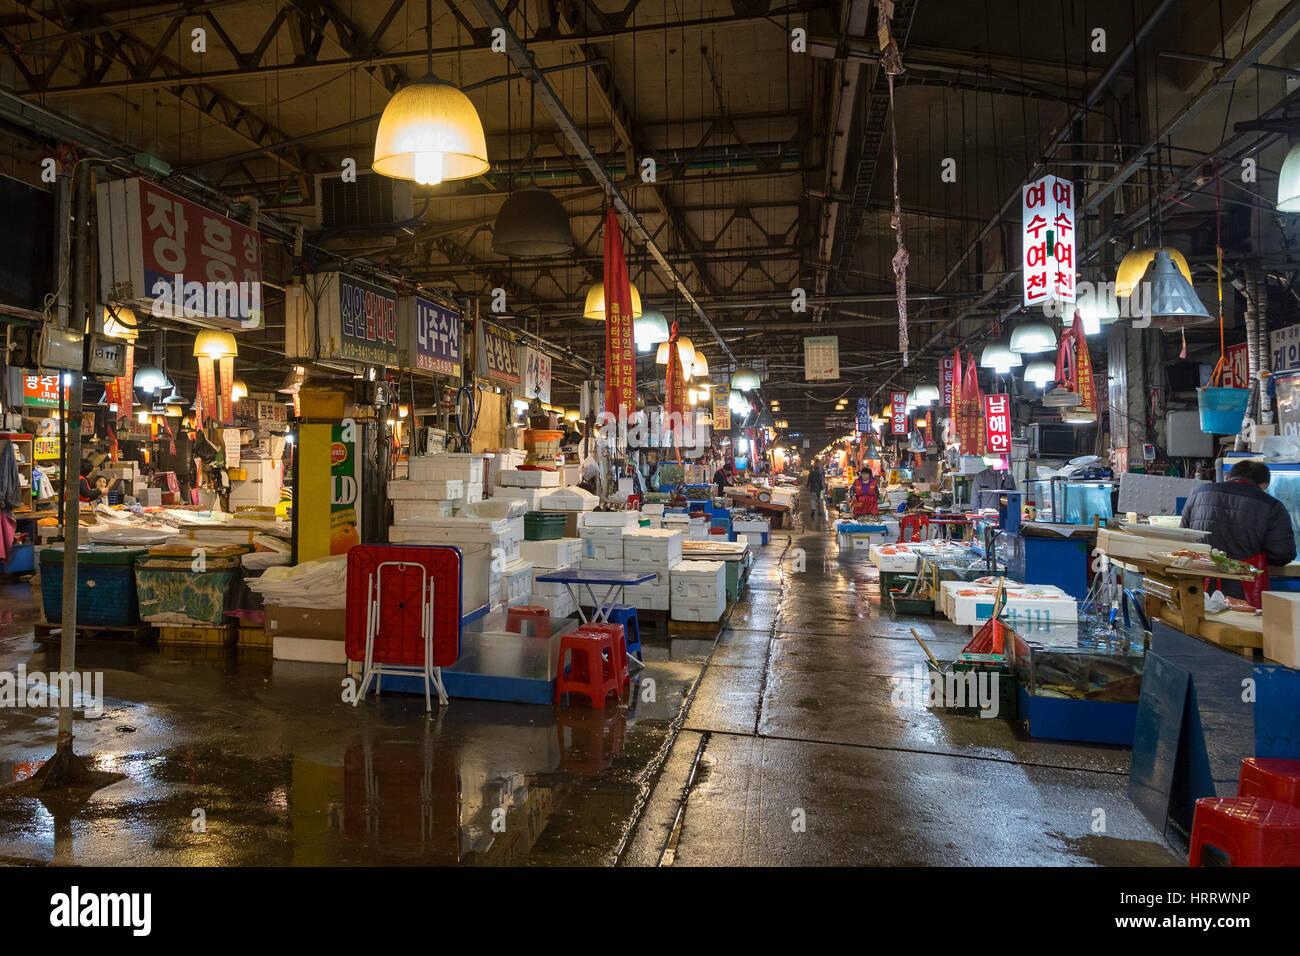 View of inside the Noryangjin Fisheries Wholesale Market (or Noryangjin Fish Market) in Seoul, South Korea. Stock Photo